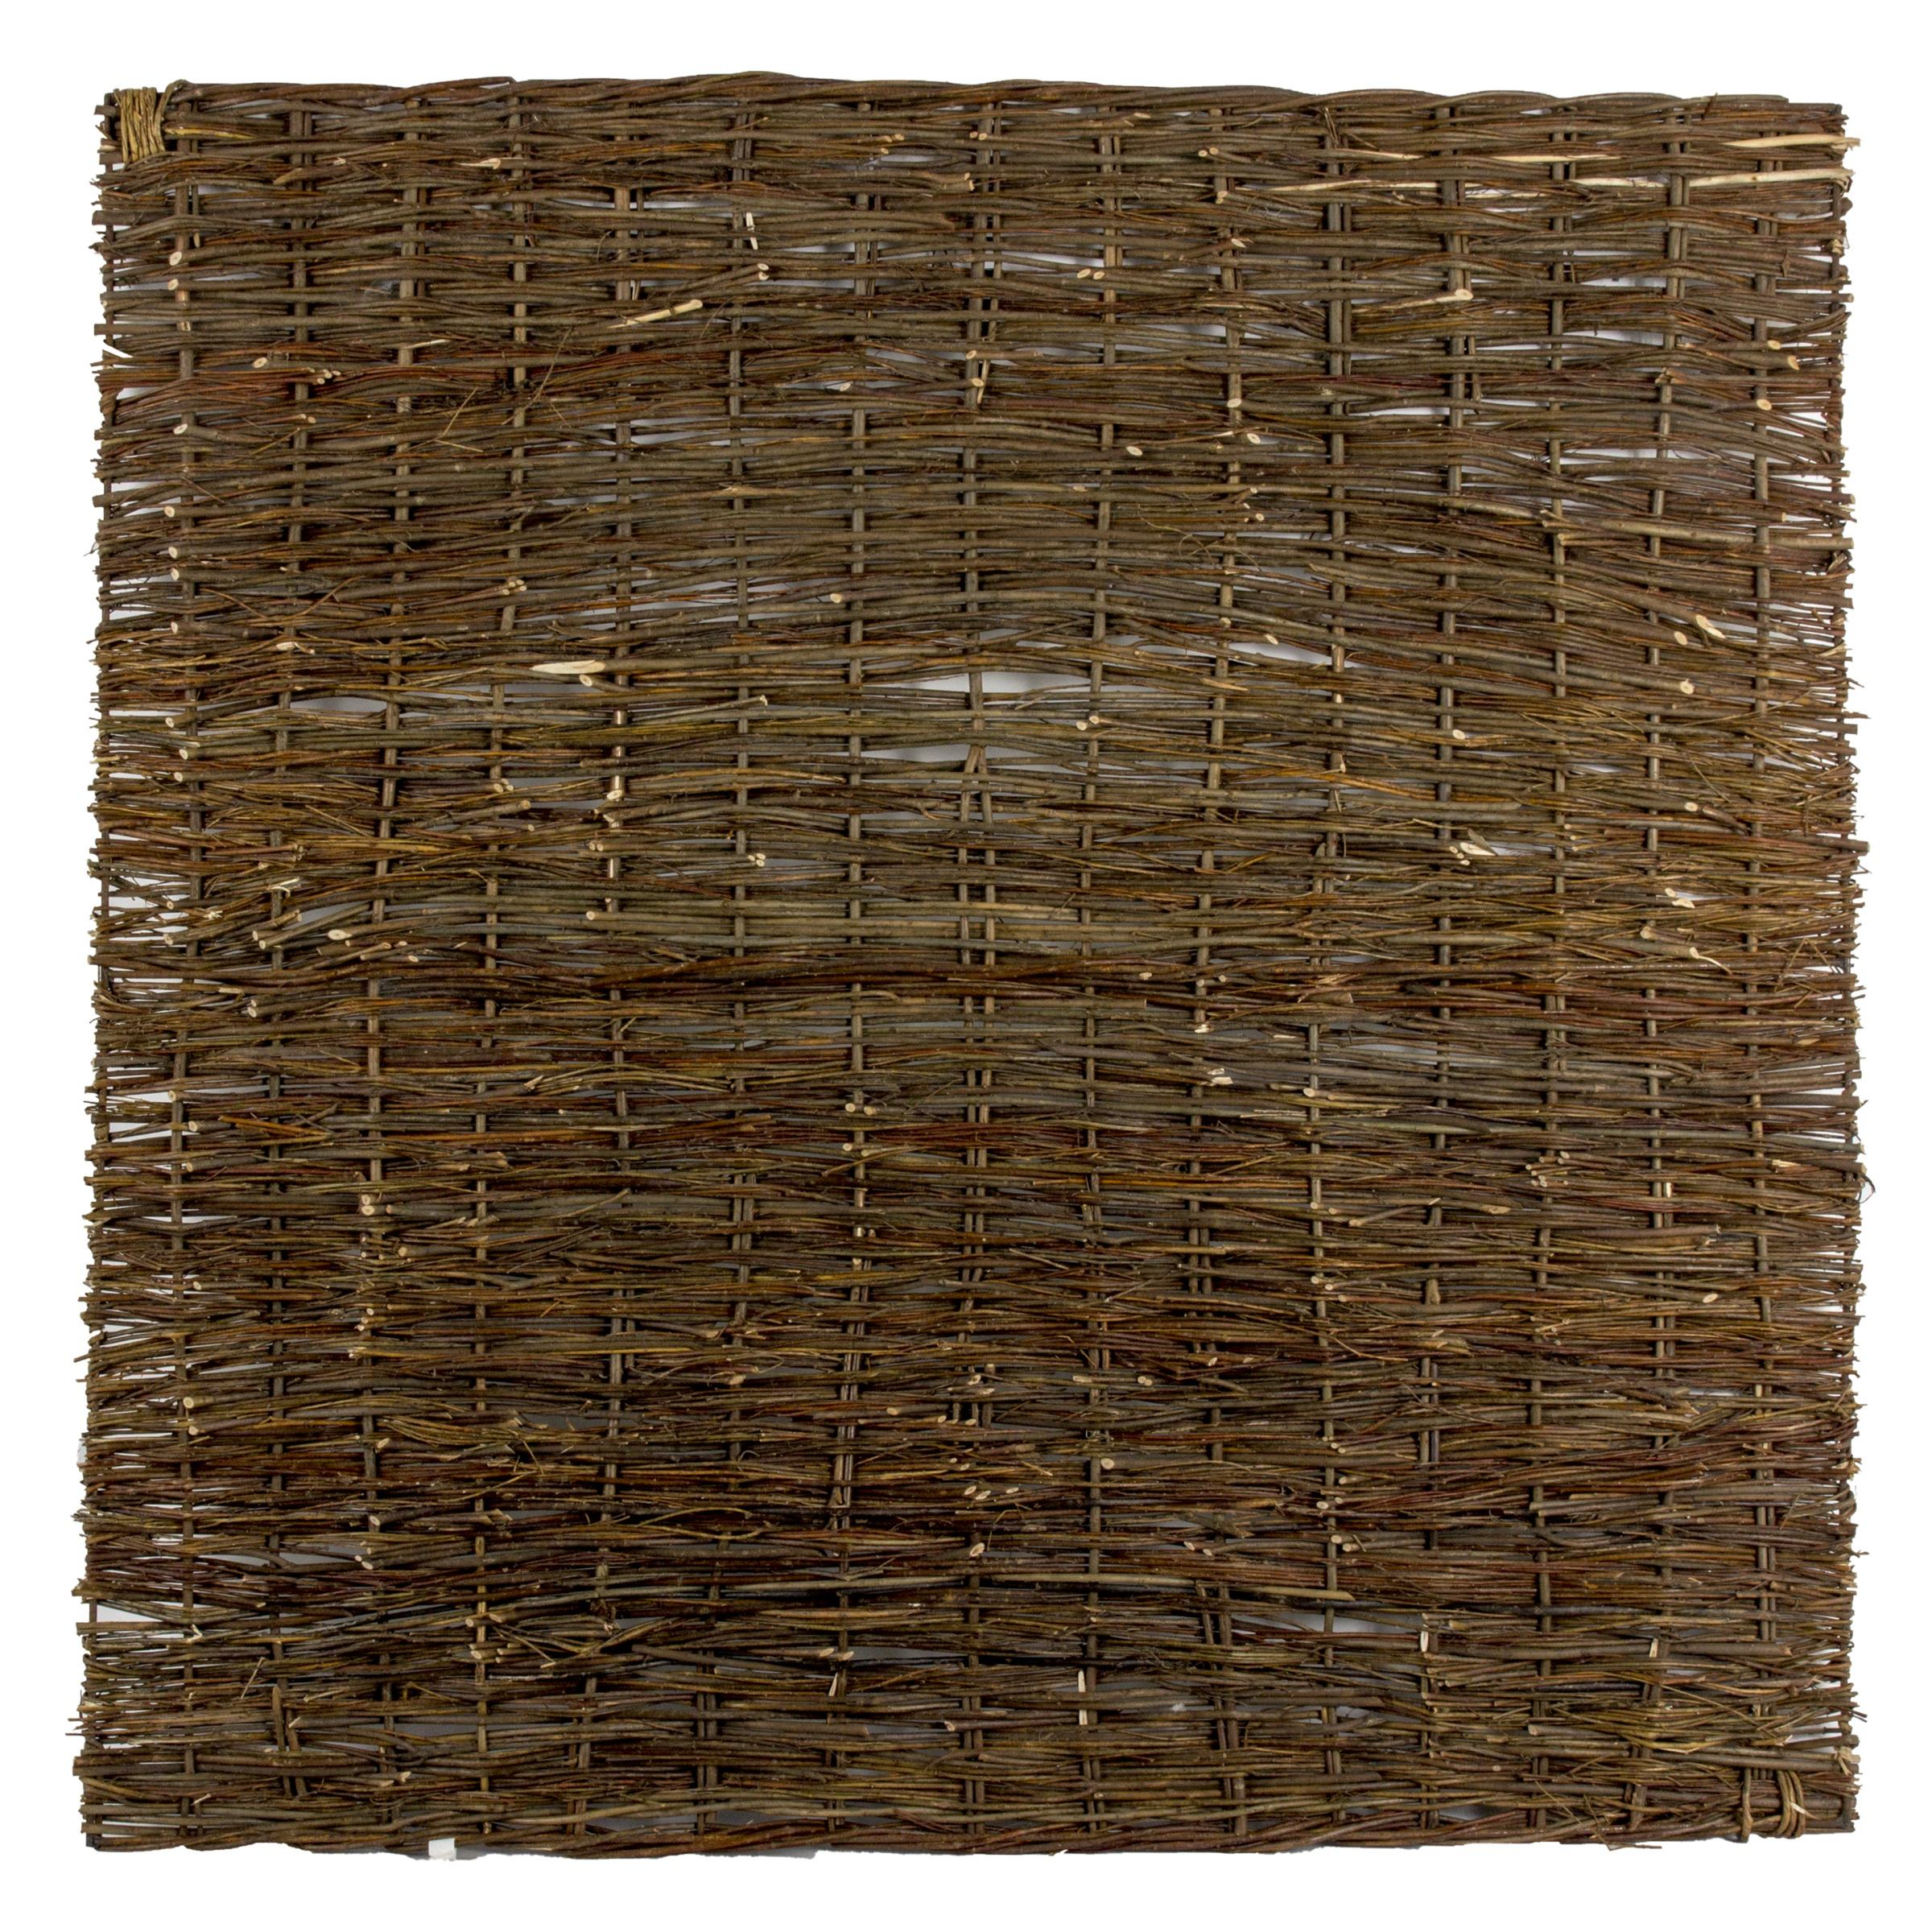 Cran de jardin en osier 180x180 cm ecrans de jardin - Ecran de jardin en bois ...